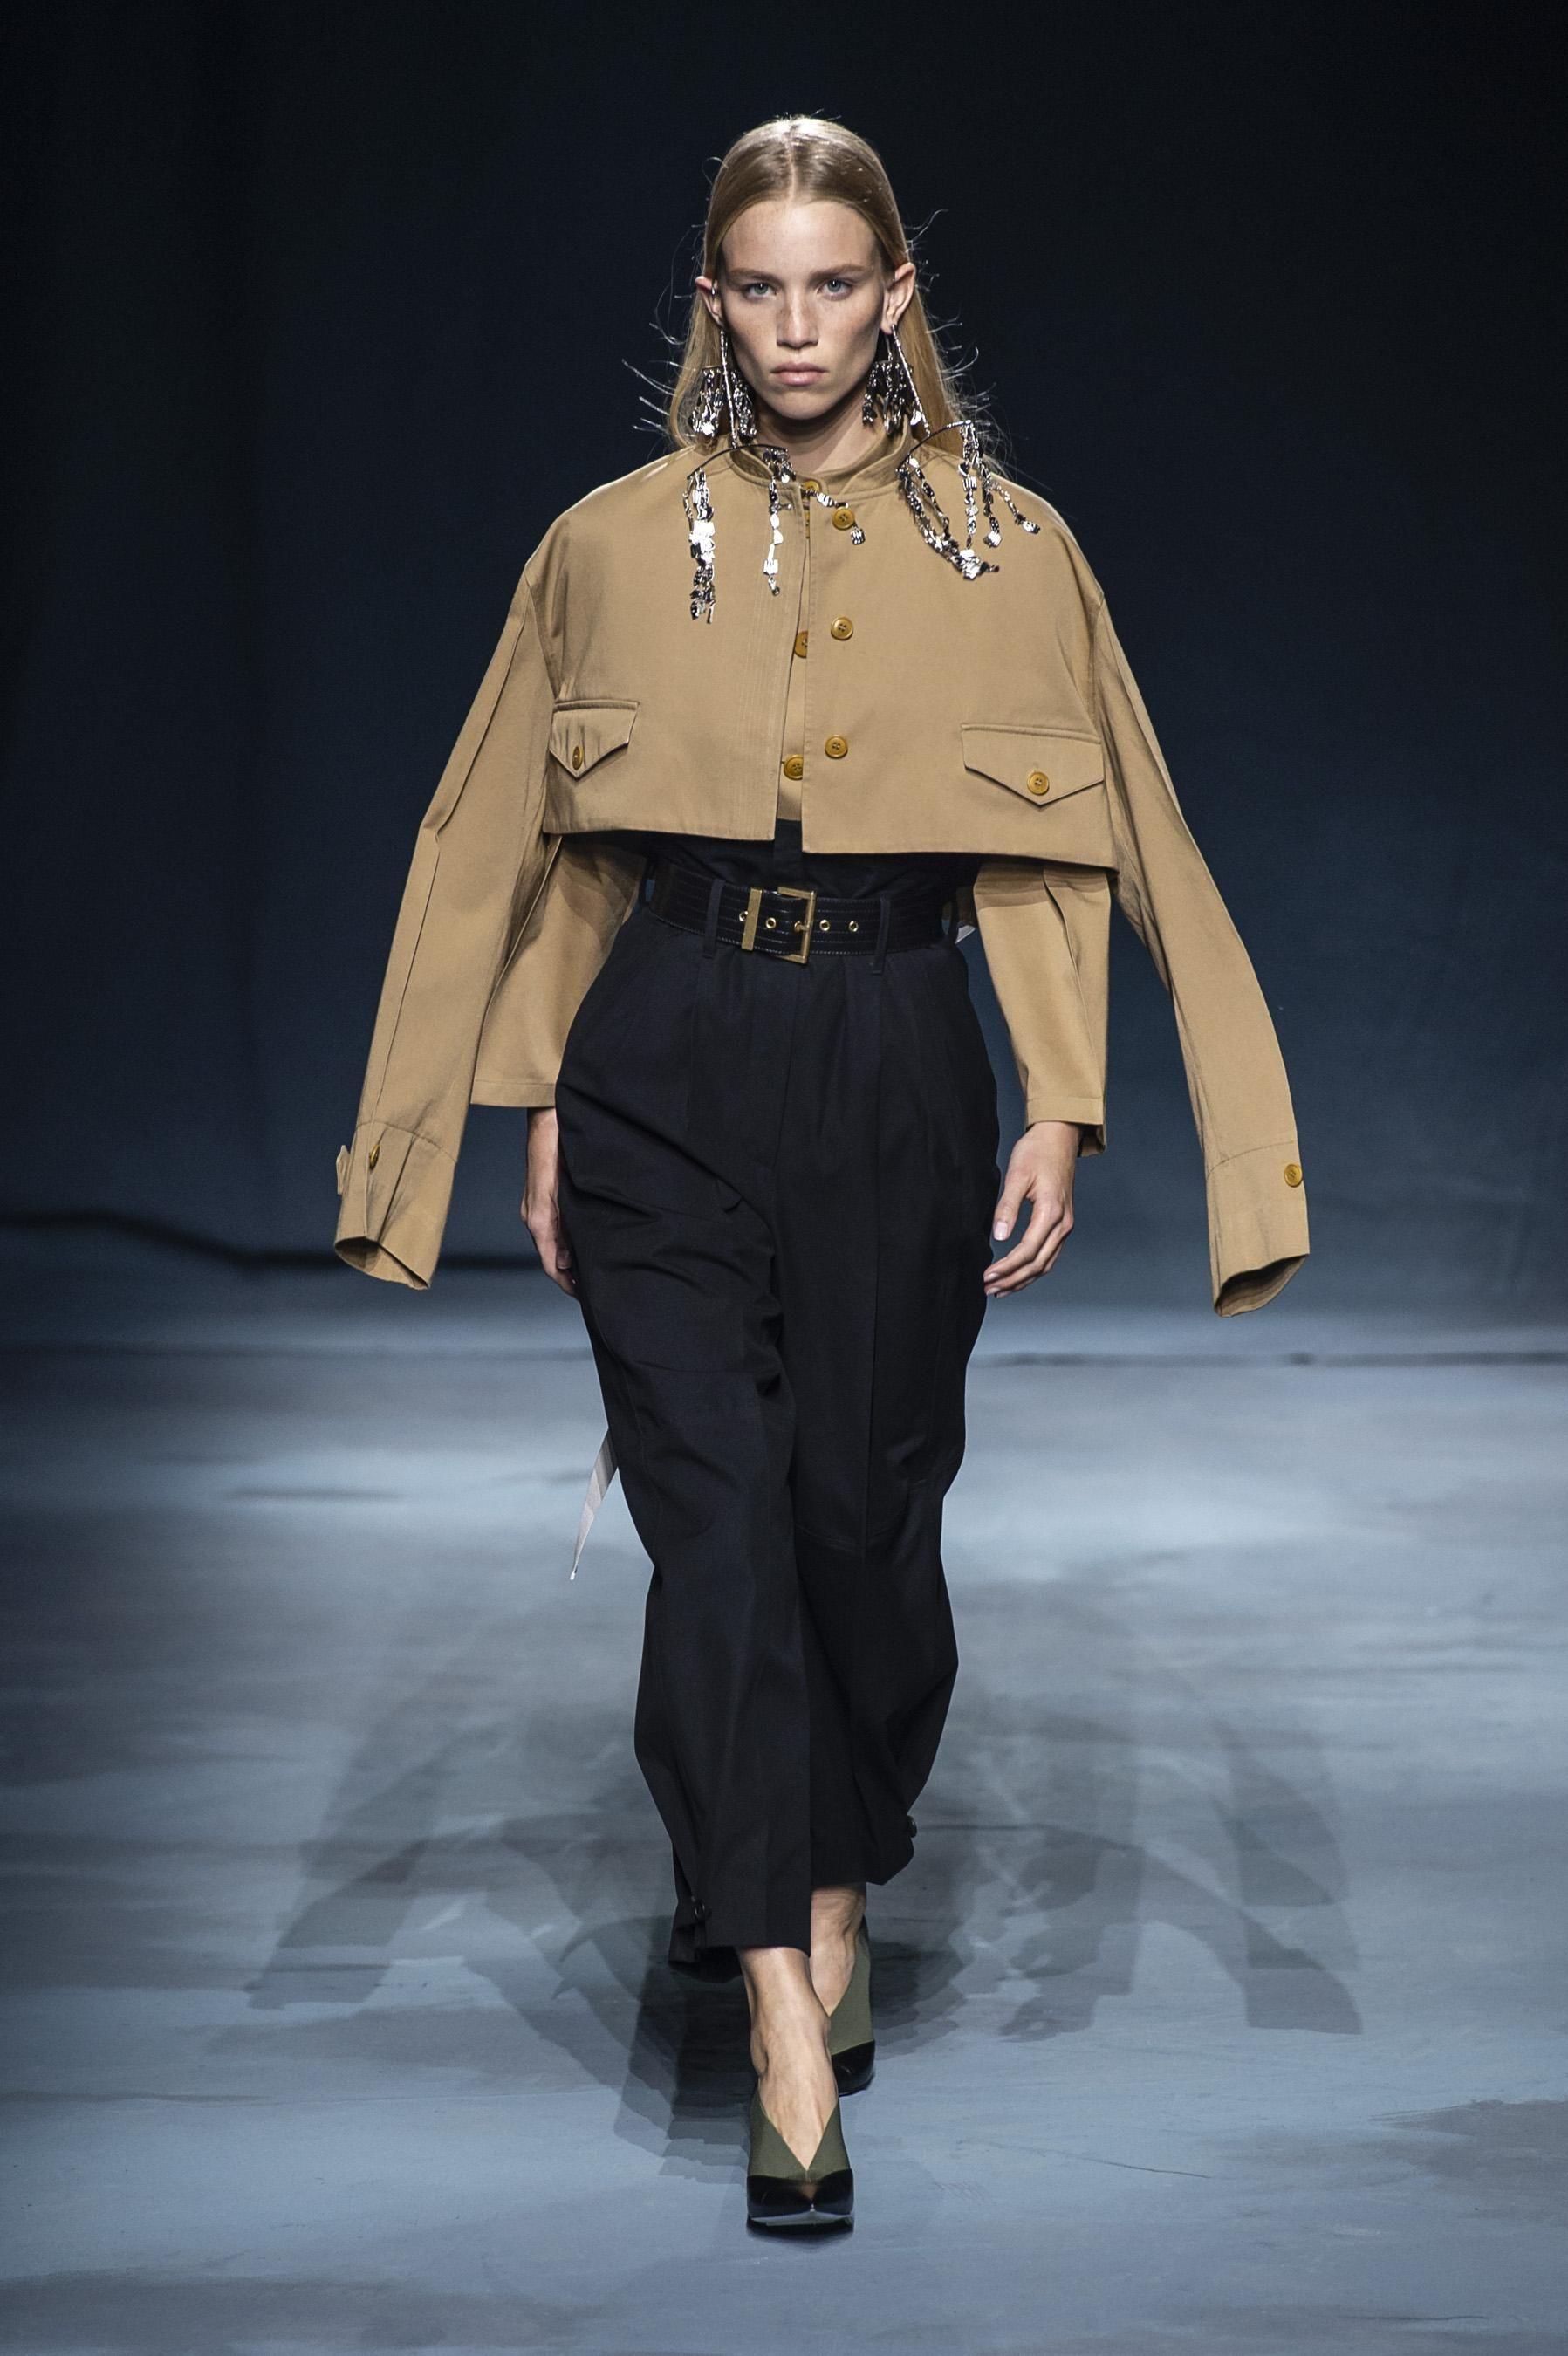 e3cf9c8013a Défilé Givenchy printemps-été 2019 Prêt-à-porter - Madame Figaro